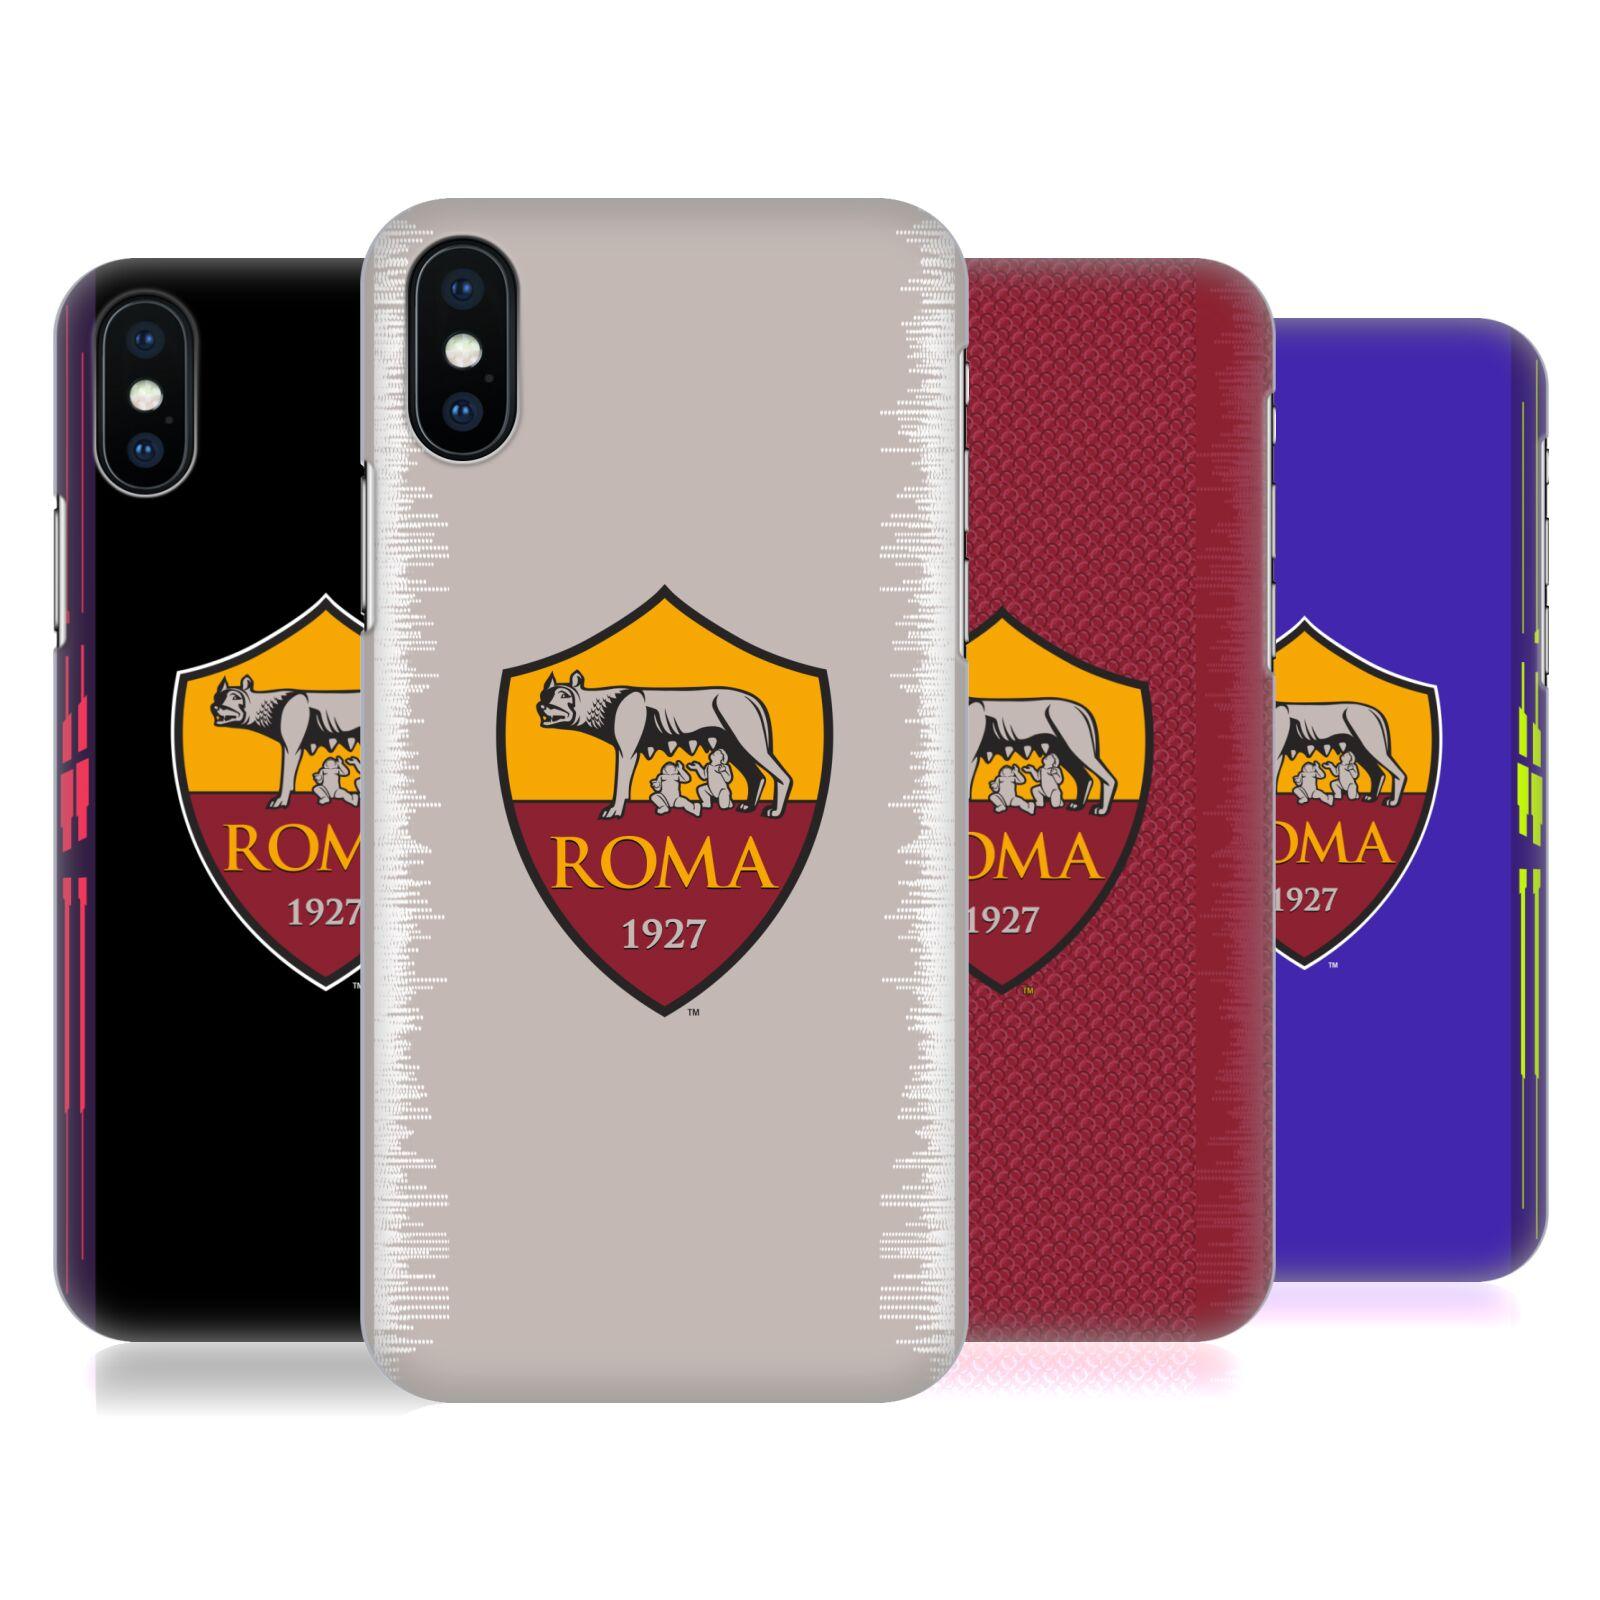 AS Roma 2018/19 Crest Kit